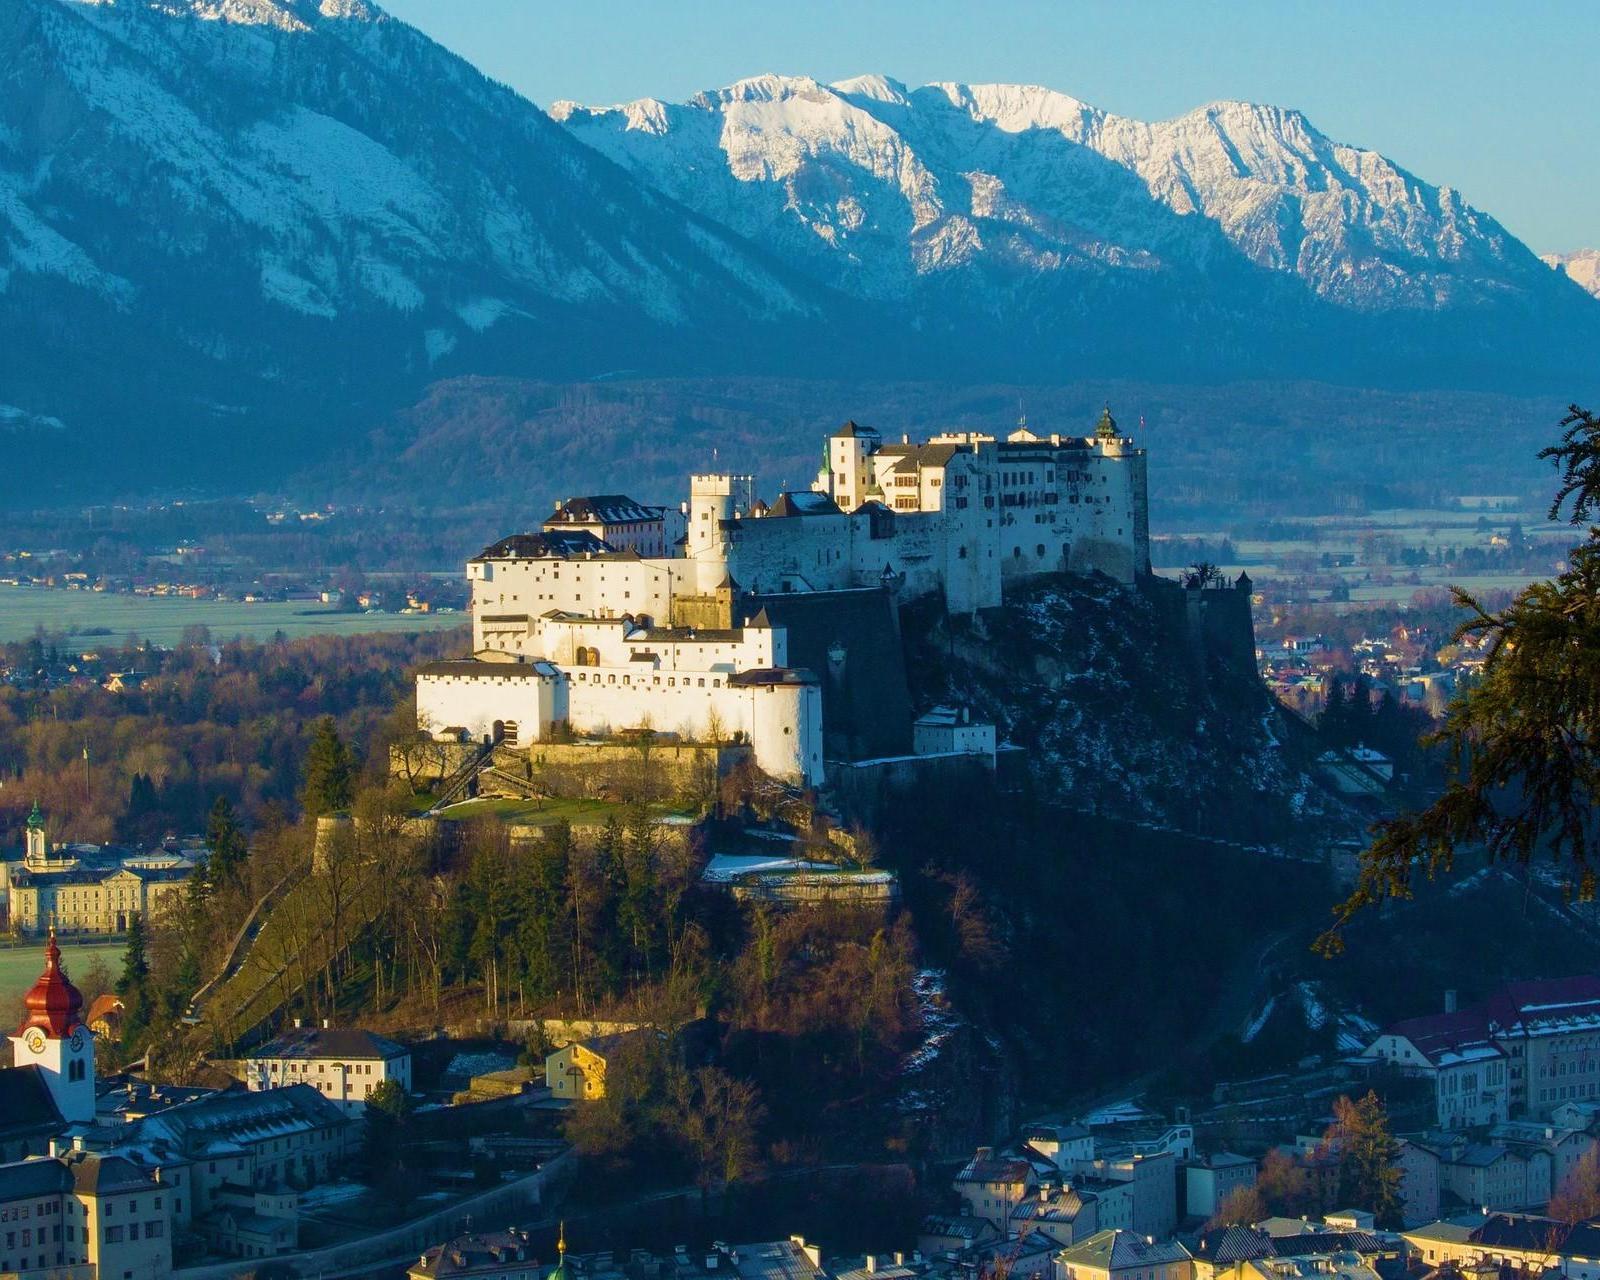 Viaje combinado por Austria. Viajando por la bella Austria